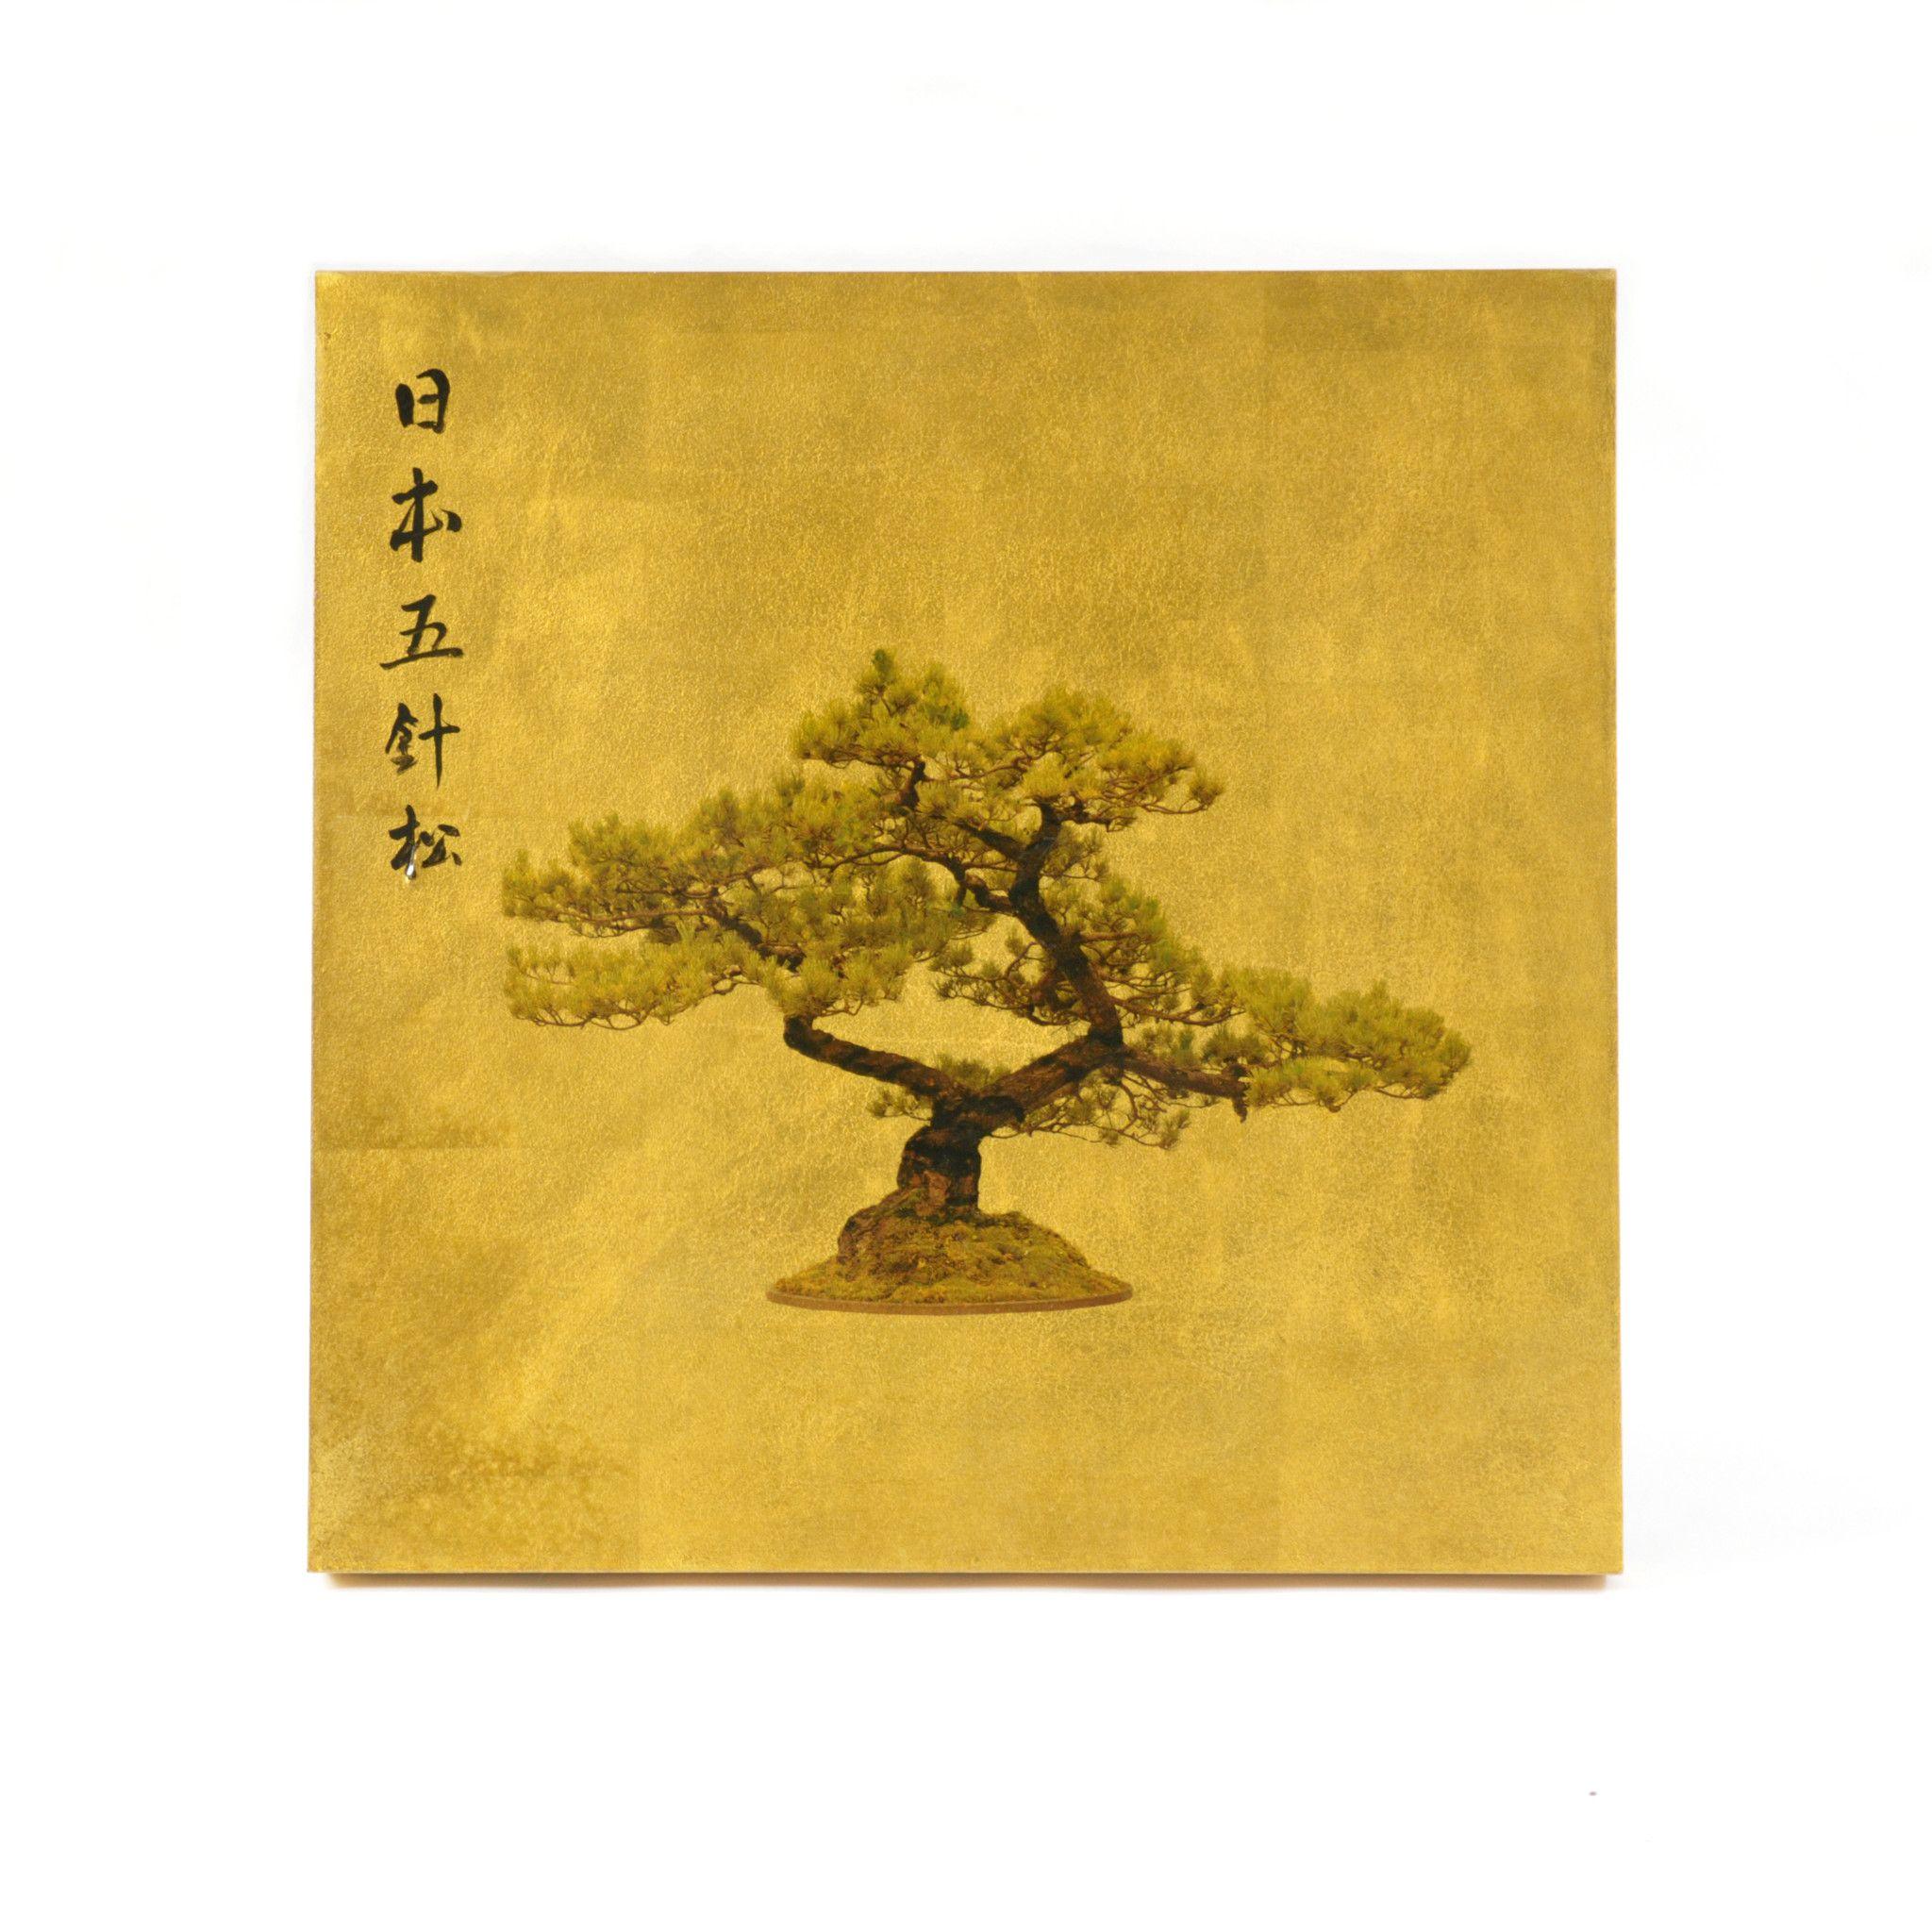 Goldleaf Chinese Bonsai Photograph: This unique photographic print ...